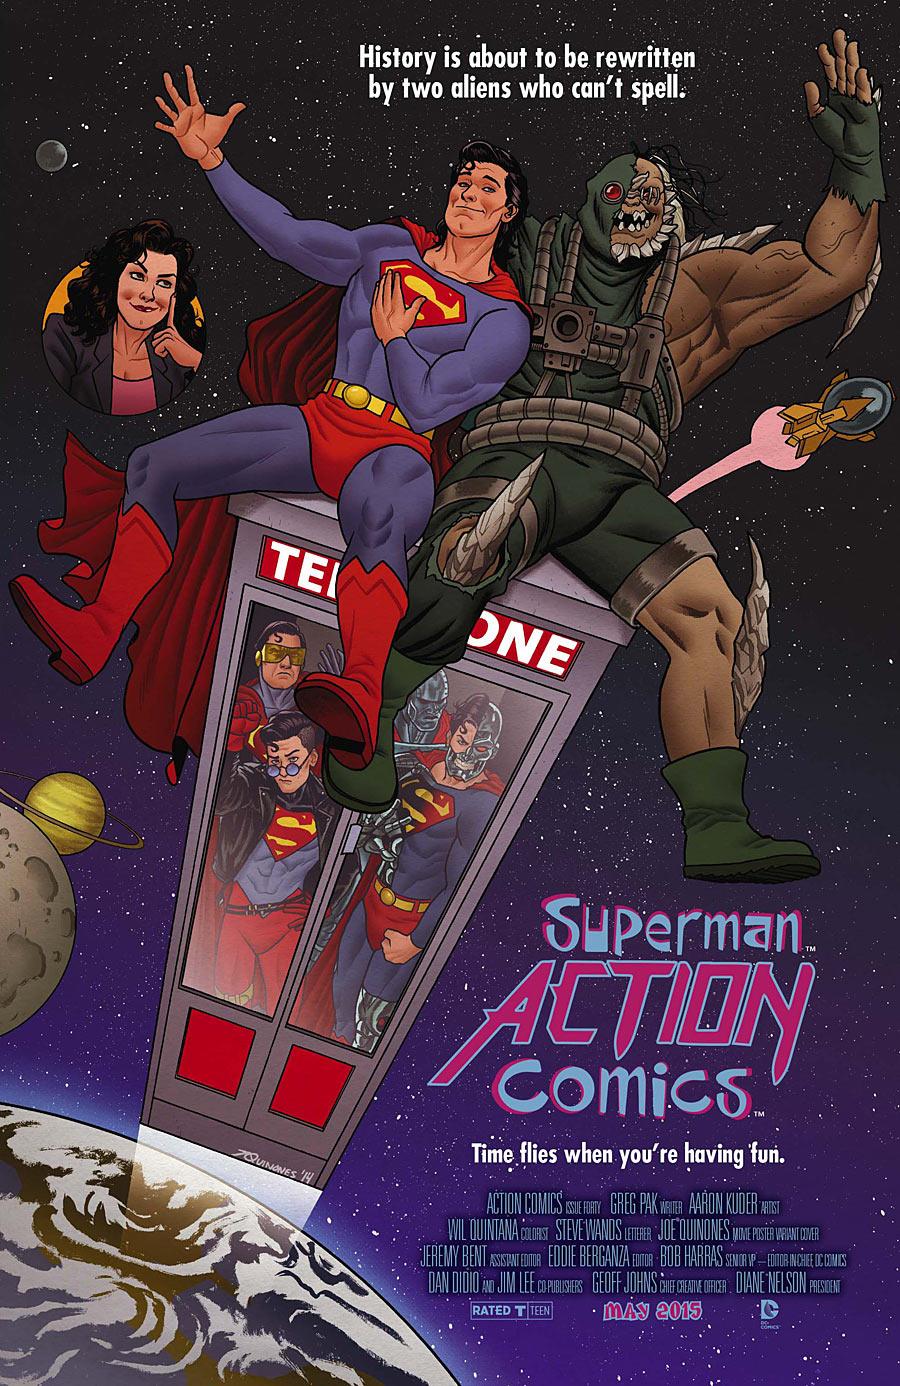 Action Comics Vol 2 40 Movie Poster Variant.jpg